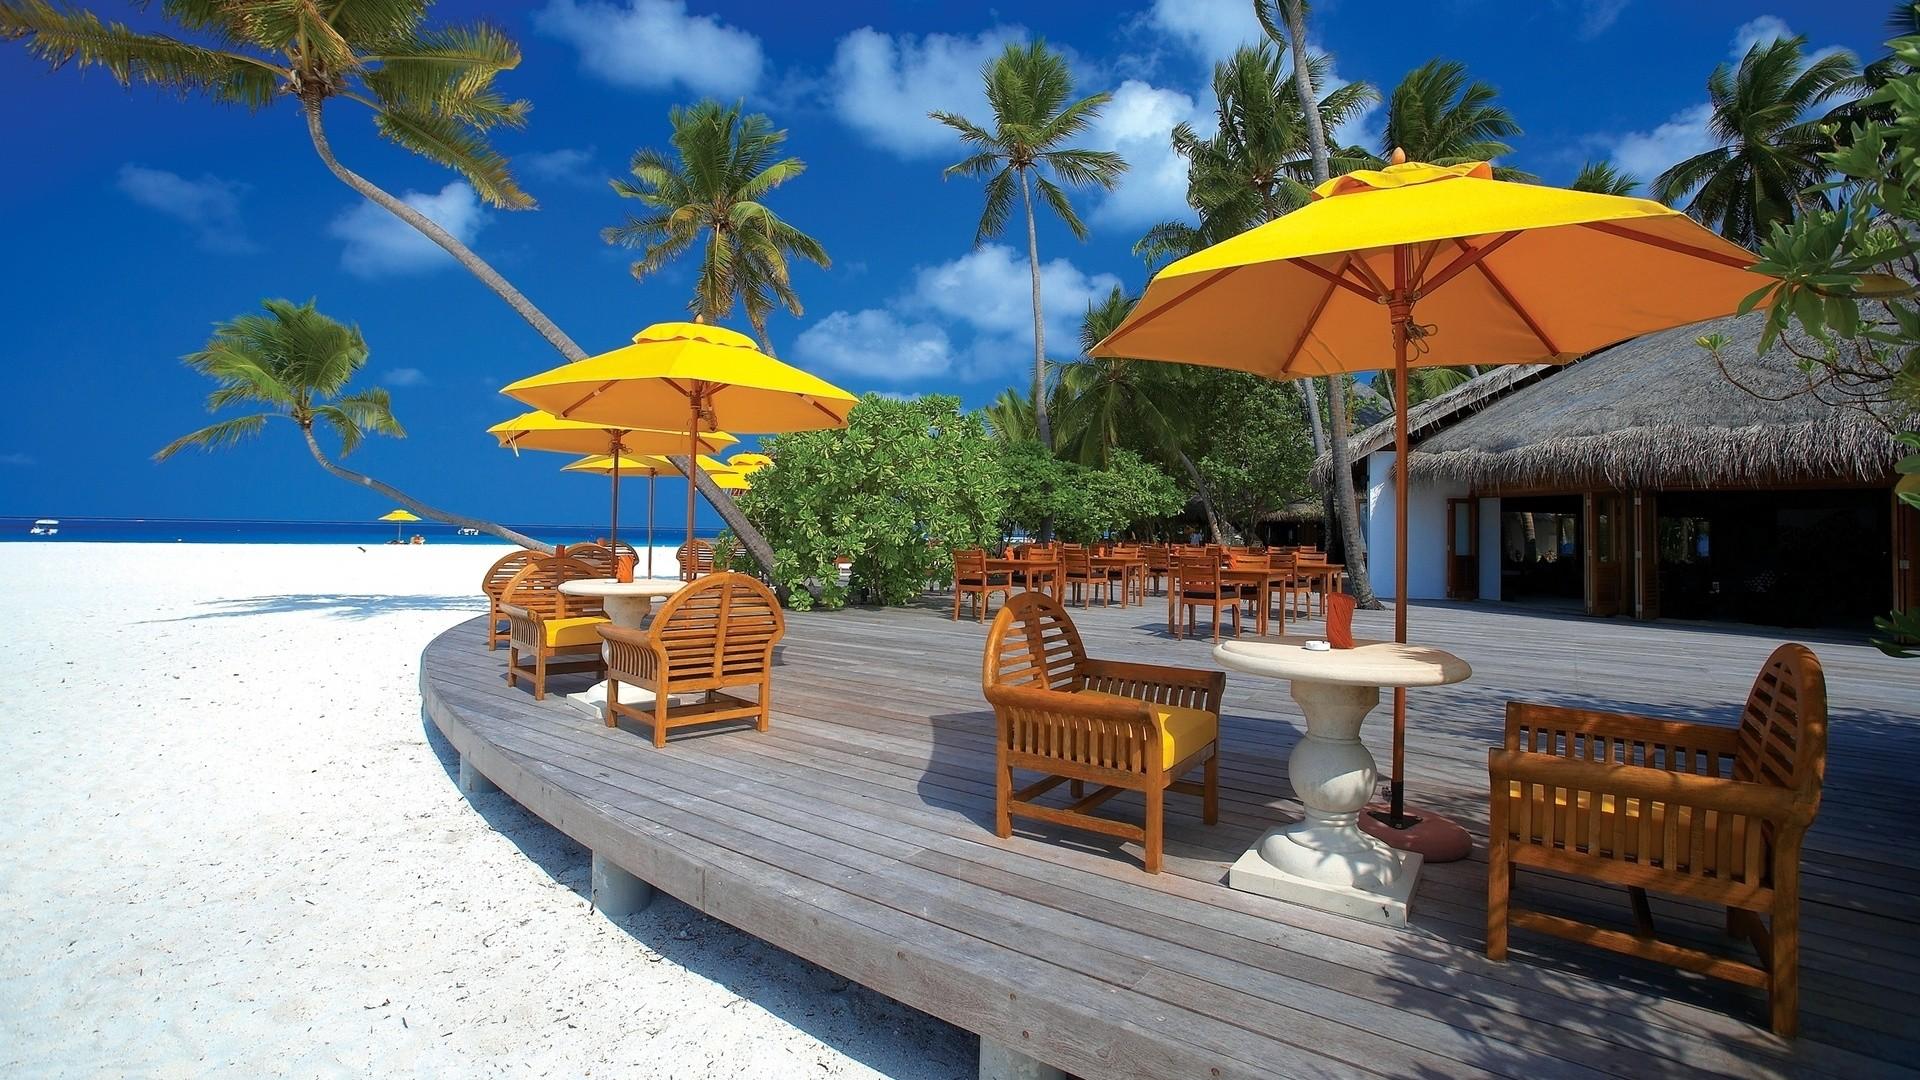 … beautiful beach resorts in the world 7 …